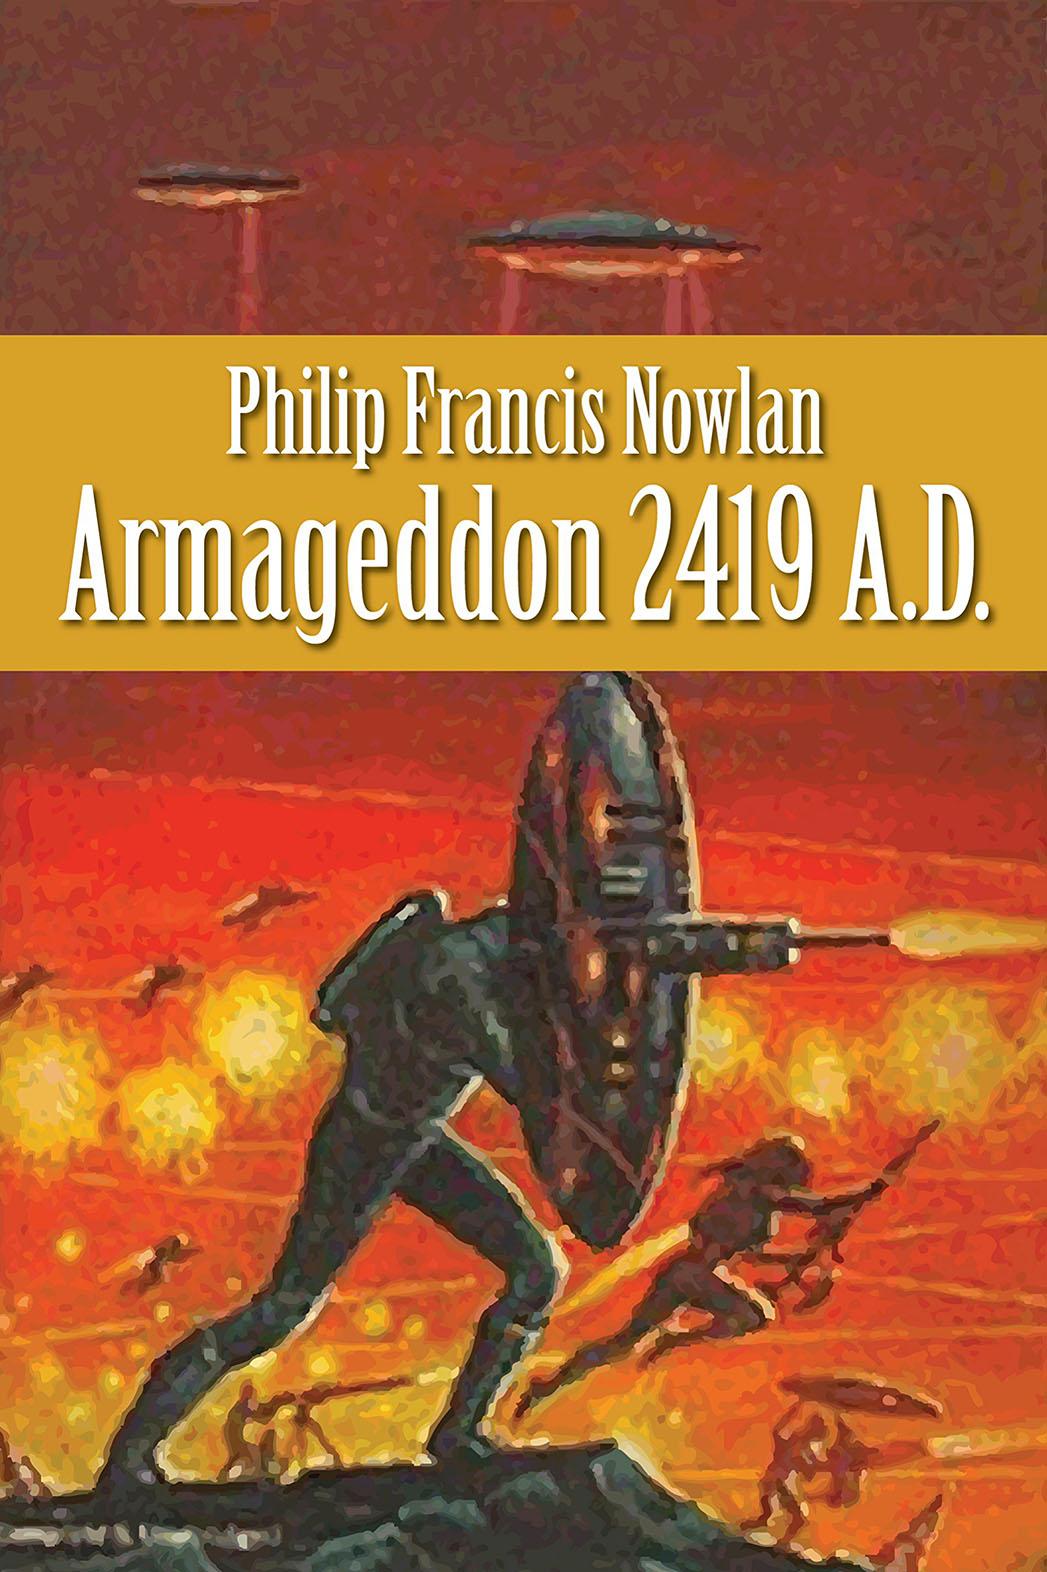 Armageddon_2419_AD Cover - P 2015